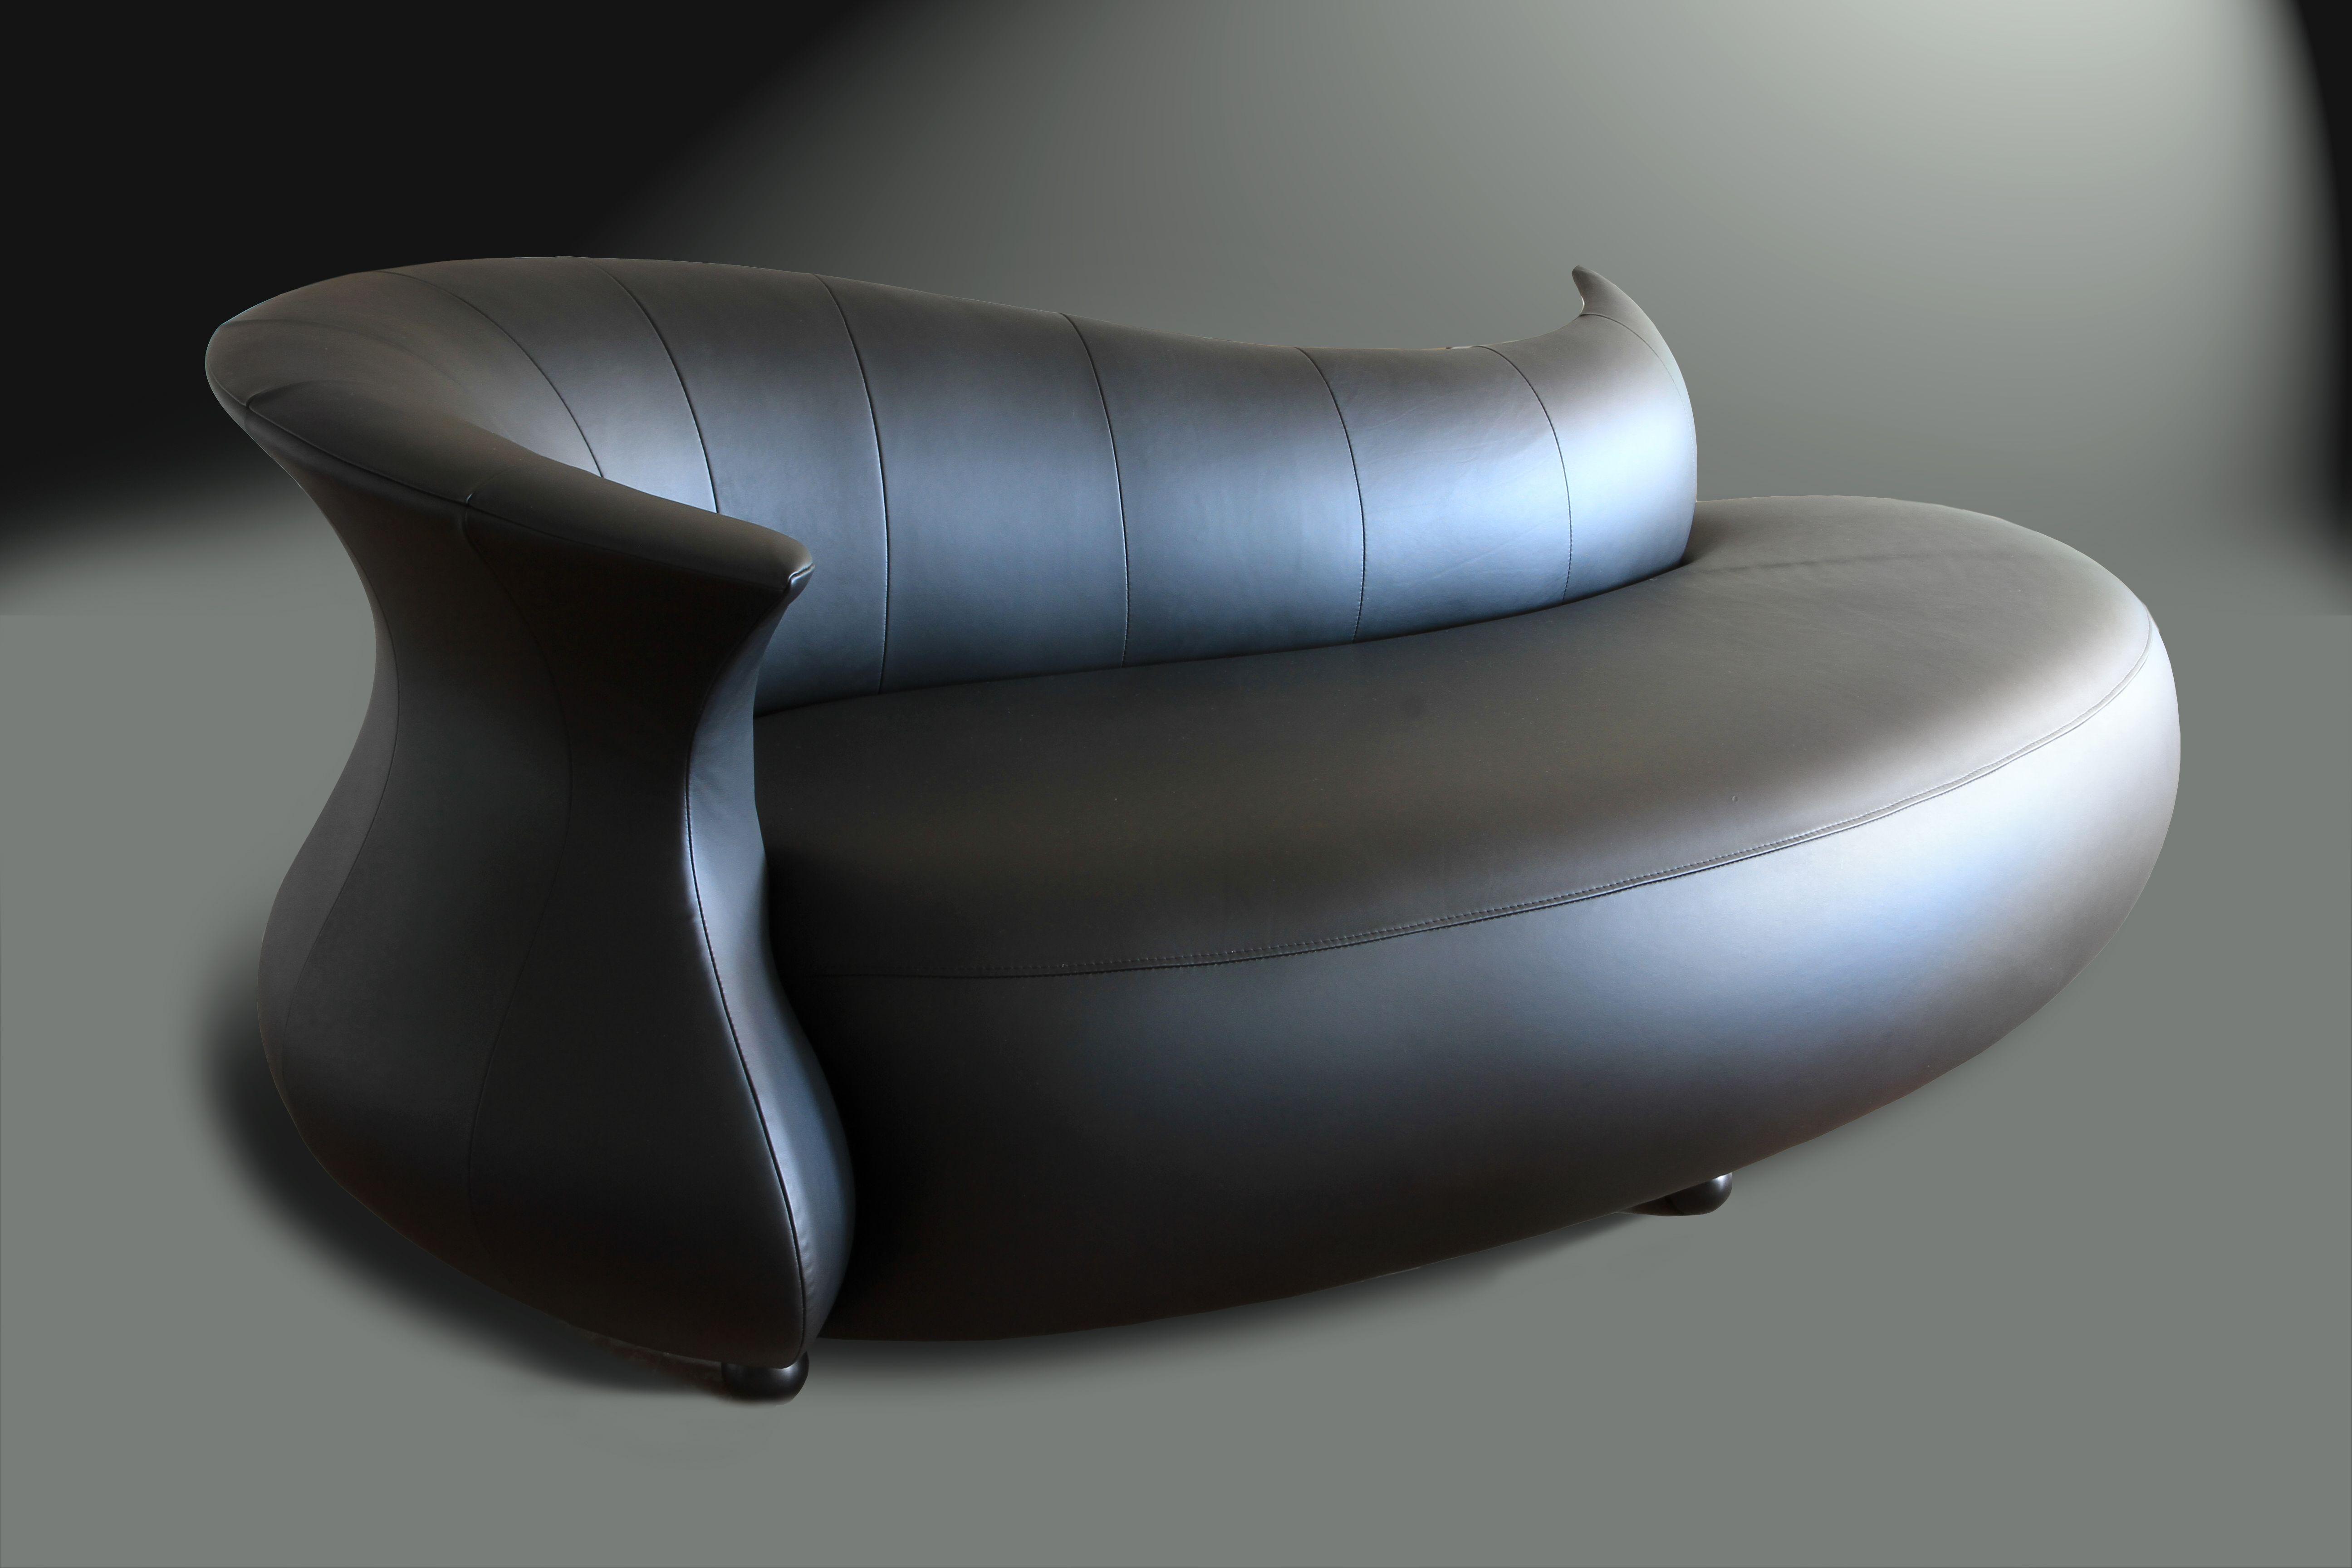 Divano Designs Furniture | AMPHORA modern chaise-lounge ...